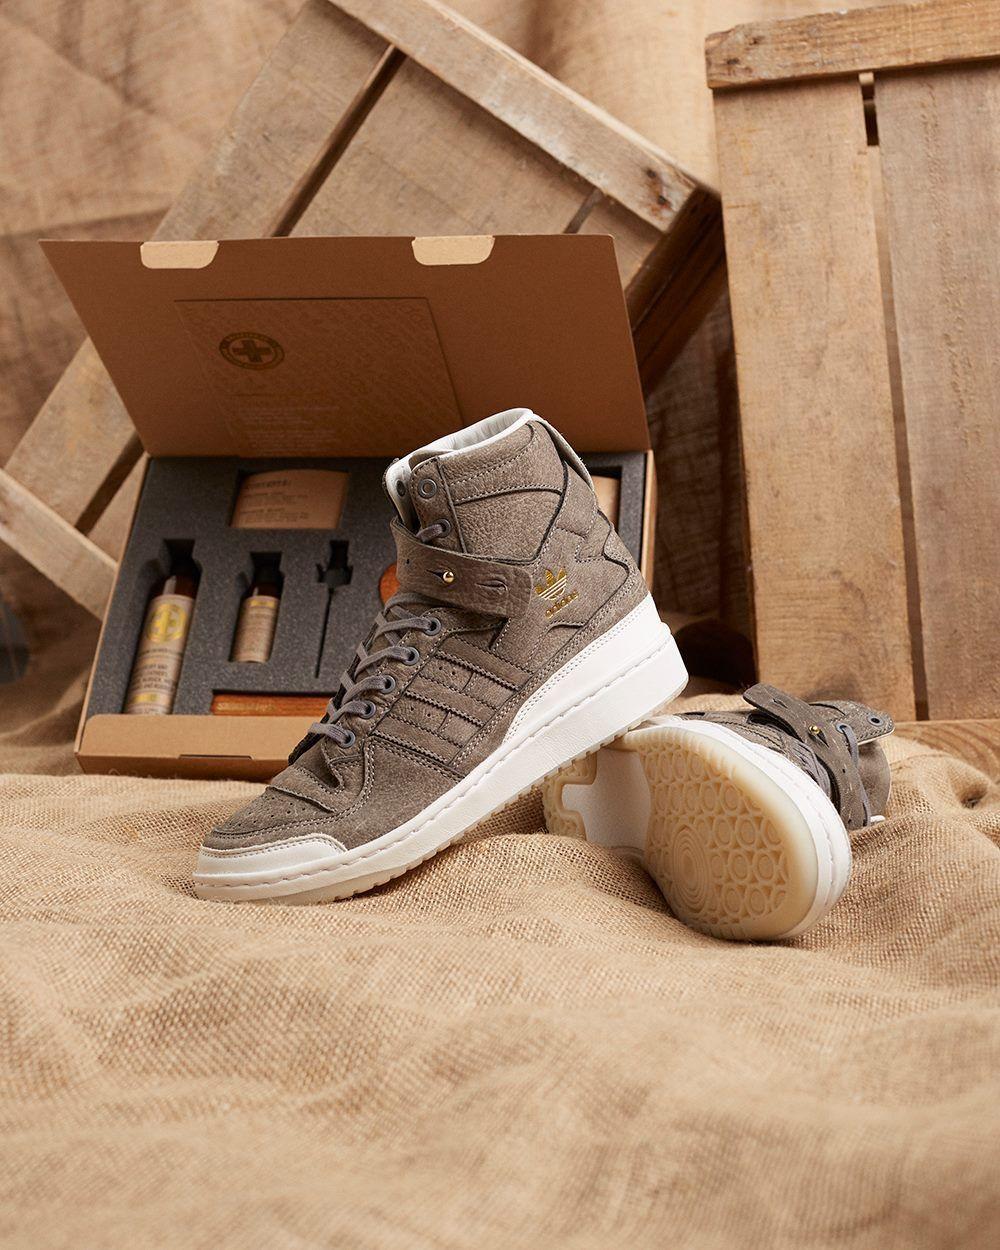 chaussures de sport dd2f6 17761 C.F Stead x adidas Originals Forum High